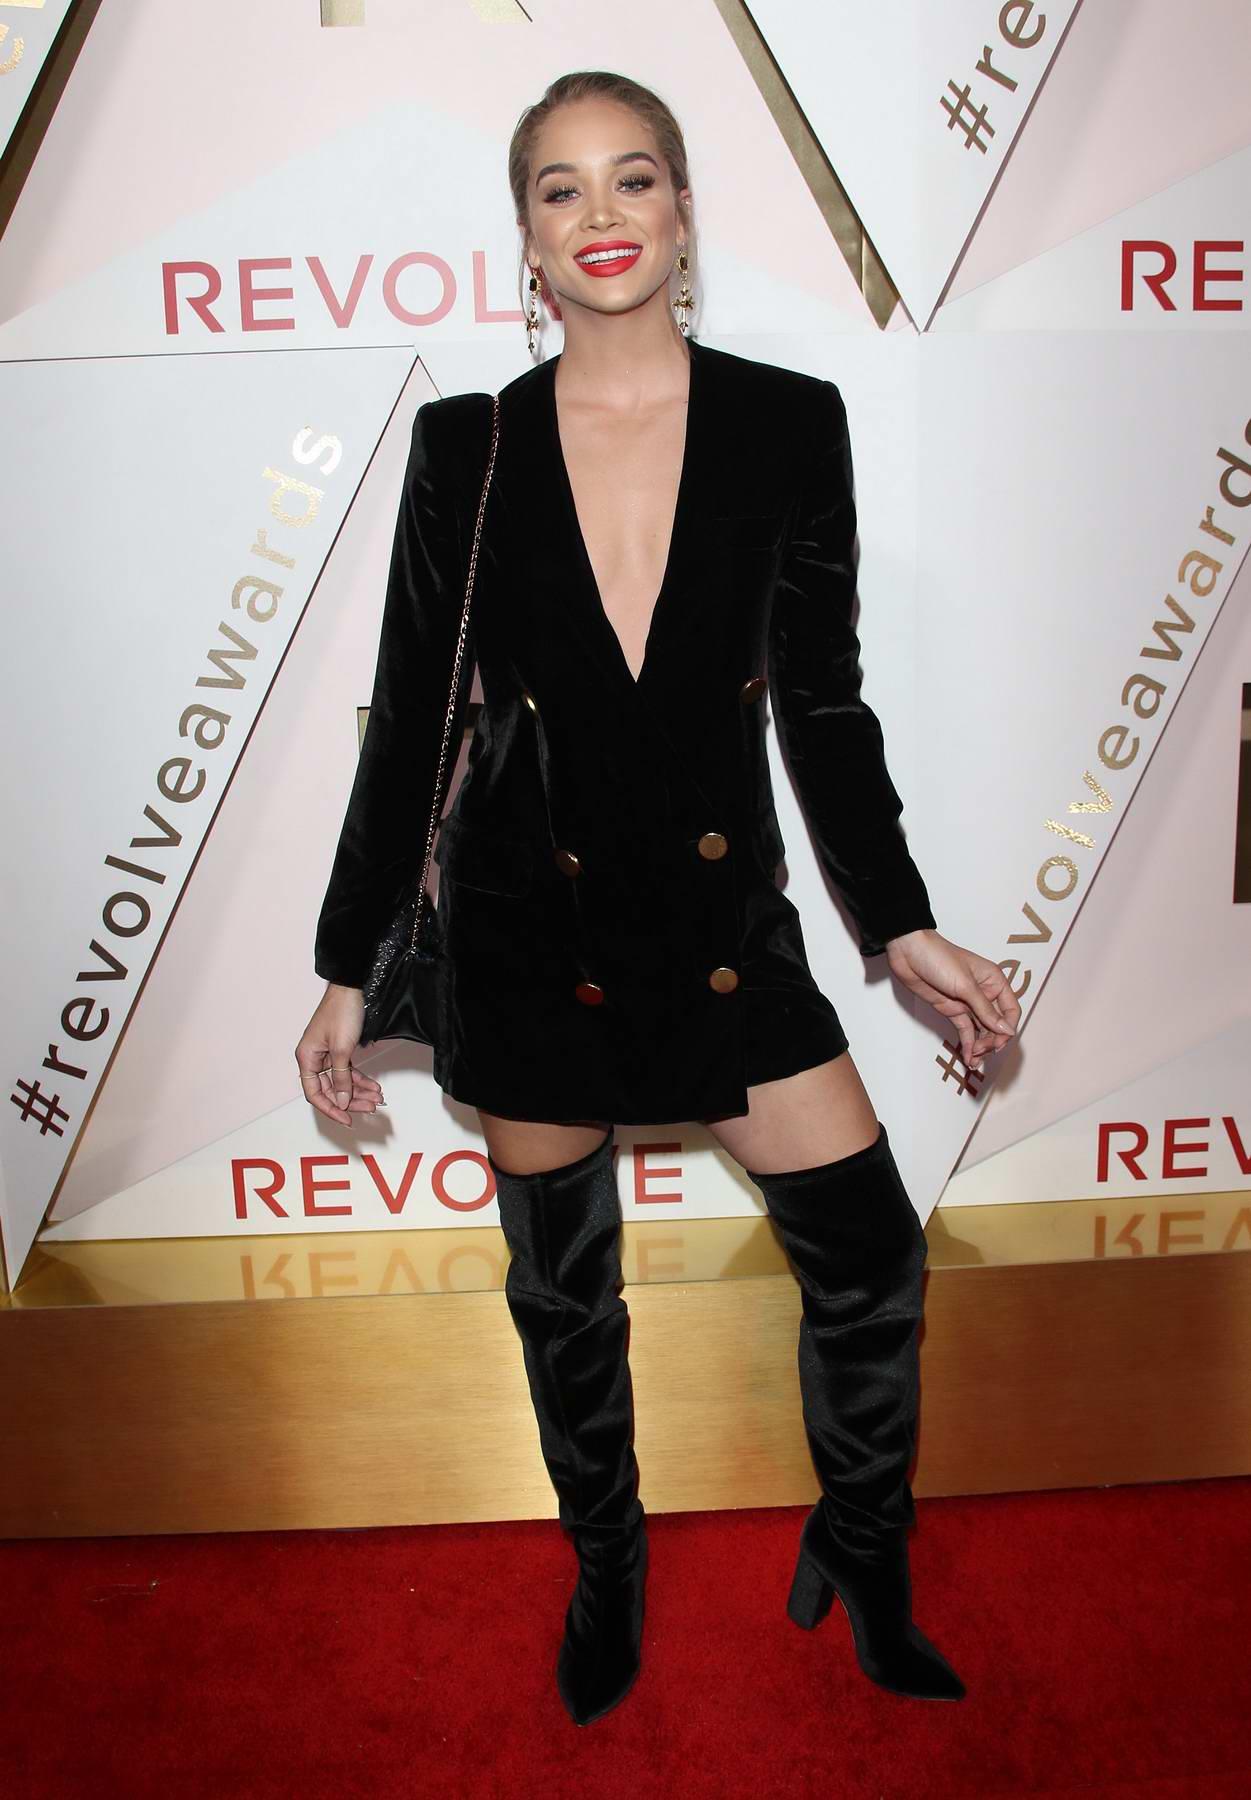 Jasmine Sanders at the REVOLVE Awards in Los Angeles